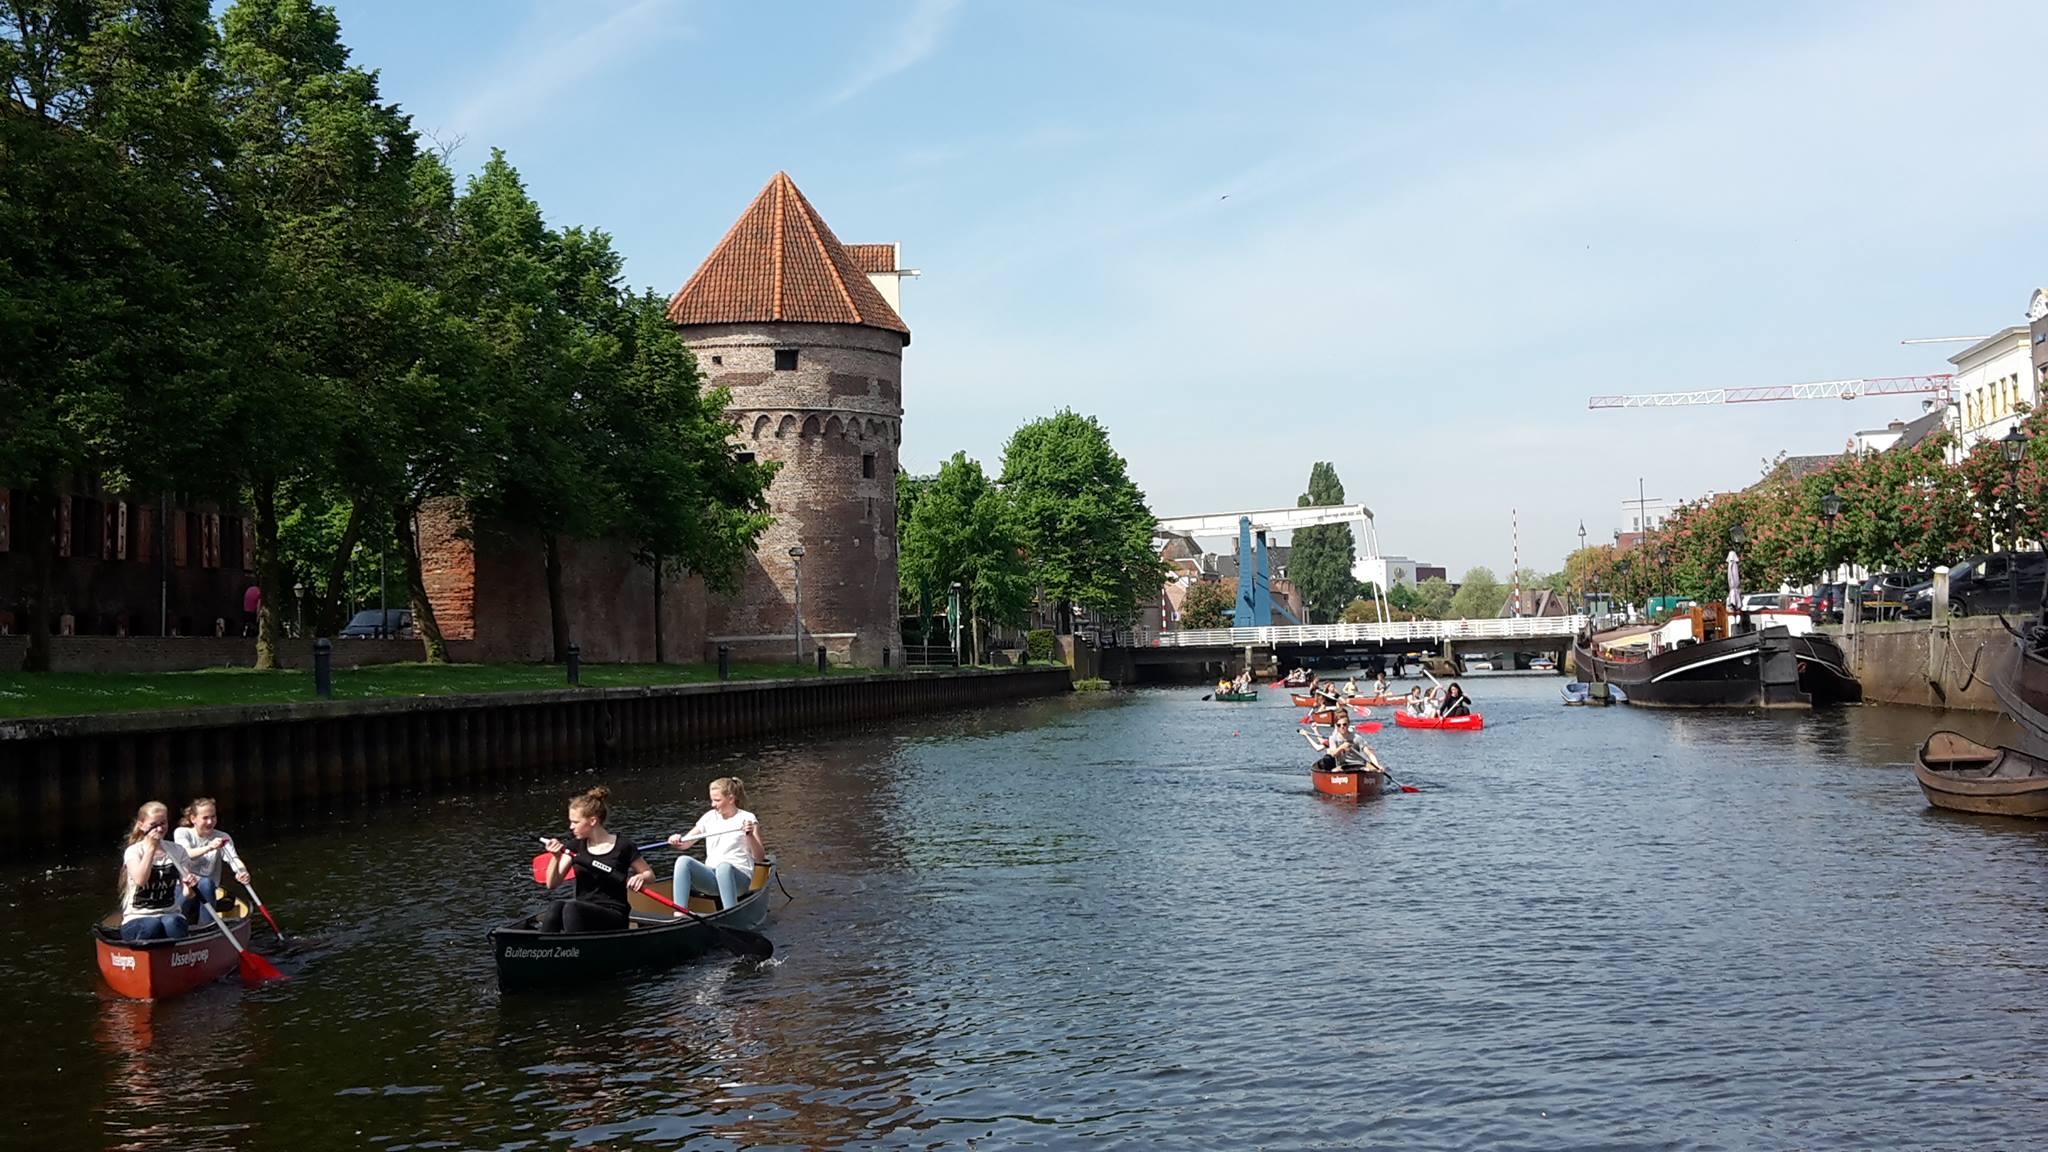 kano varen Zwolle